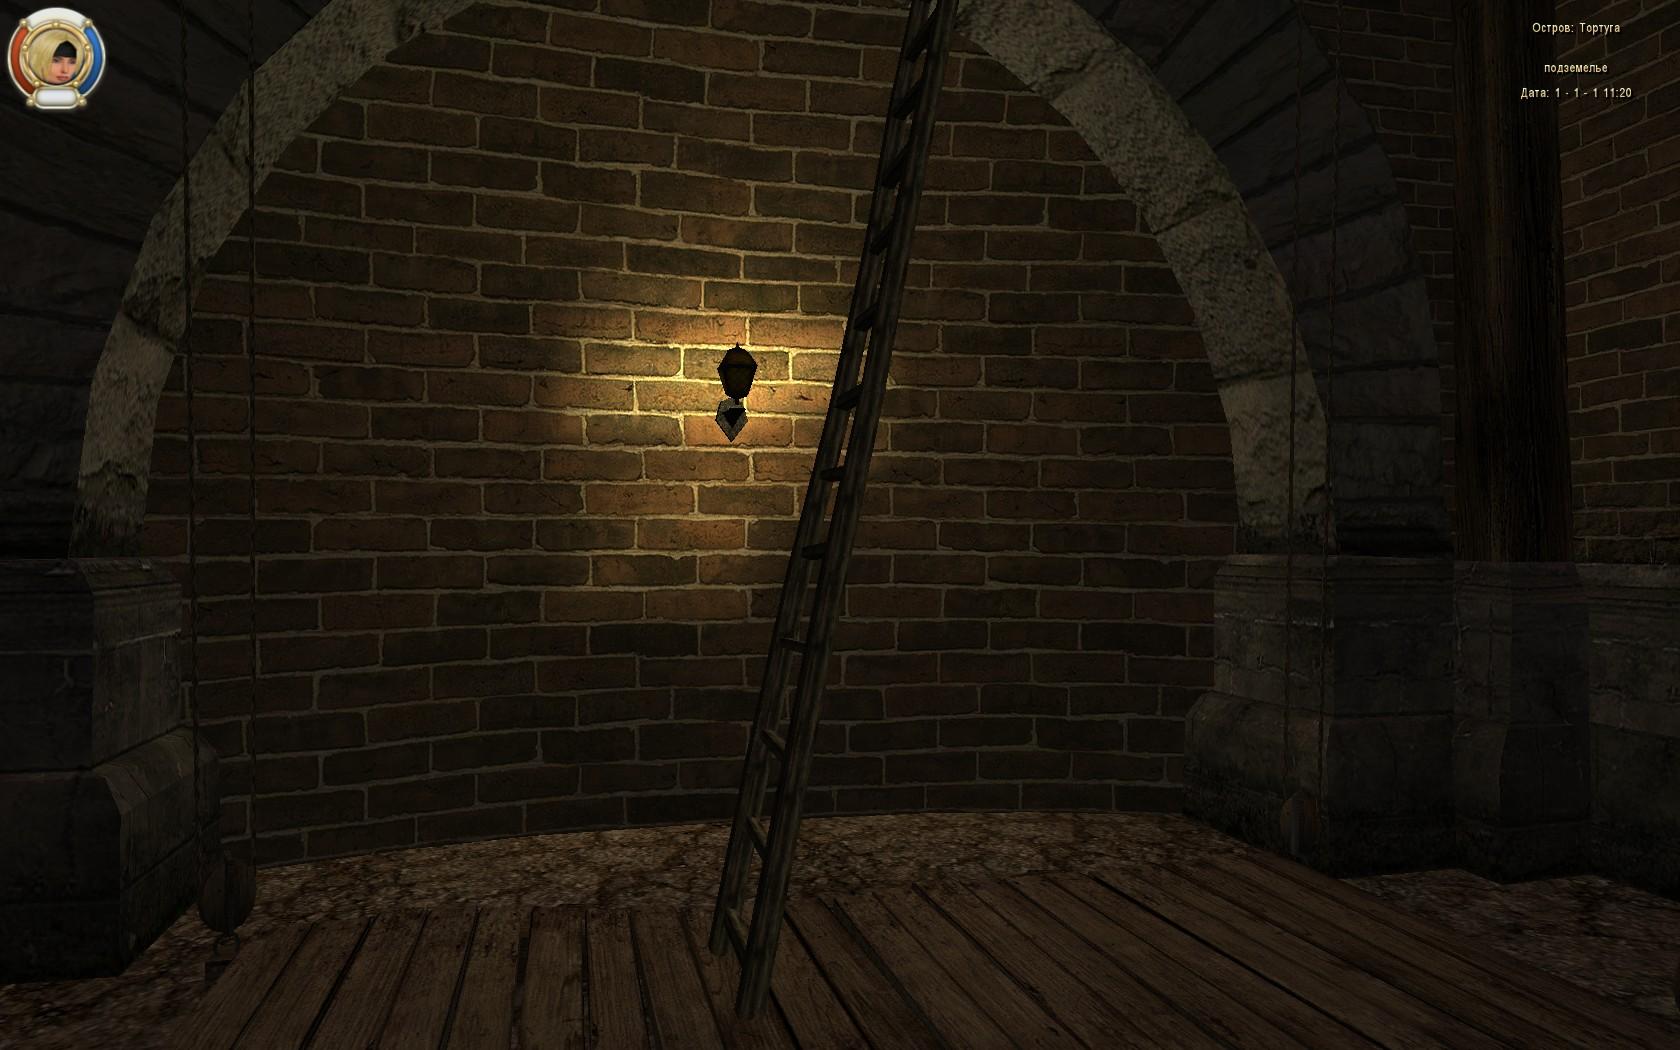 ladder2.jpg - -